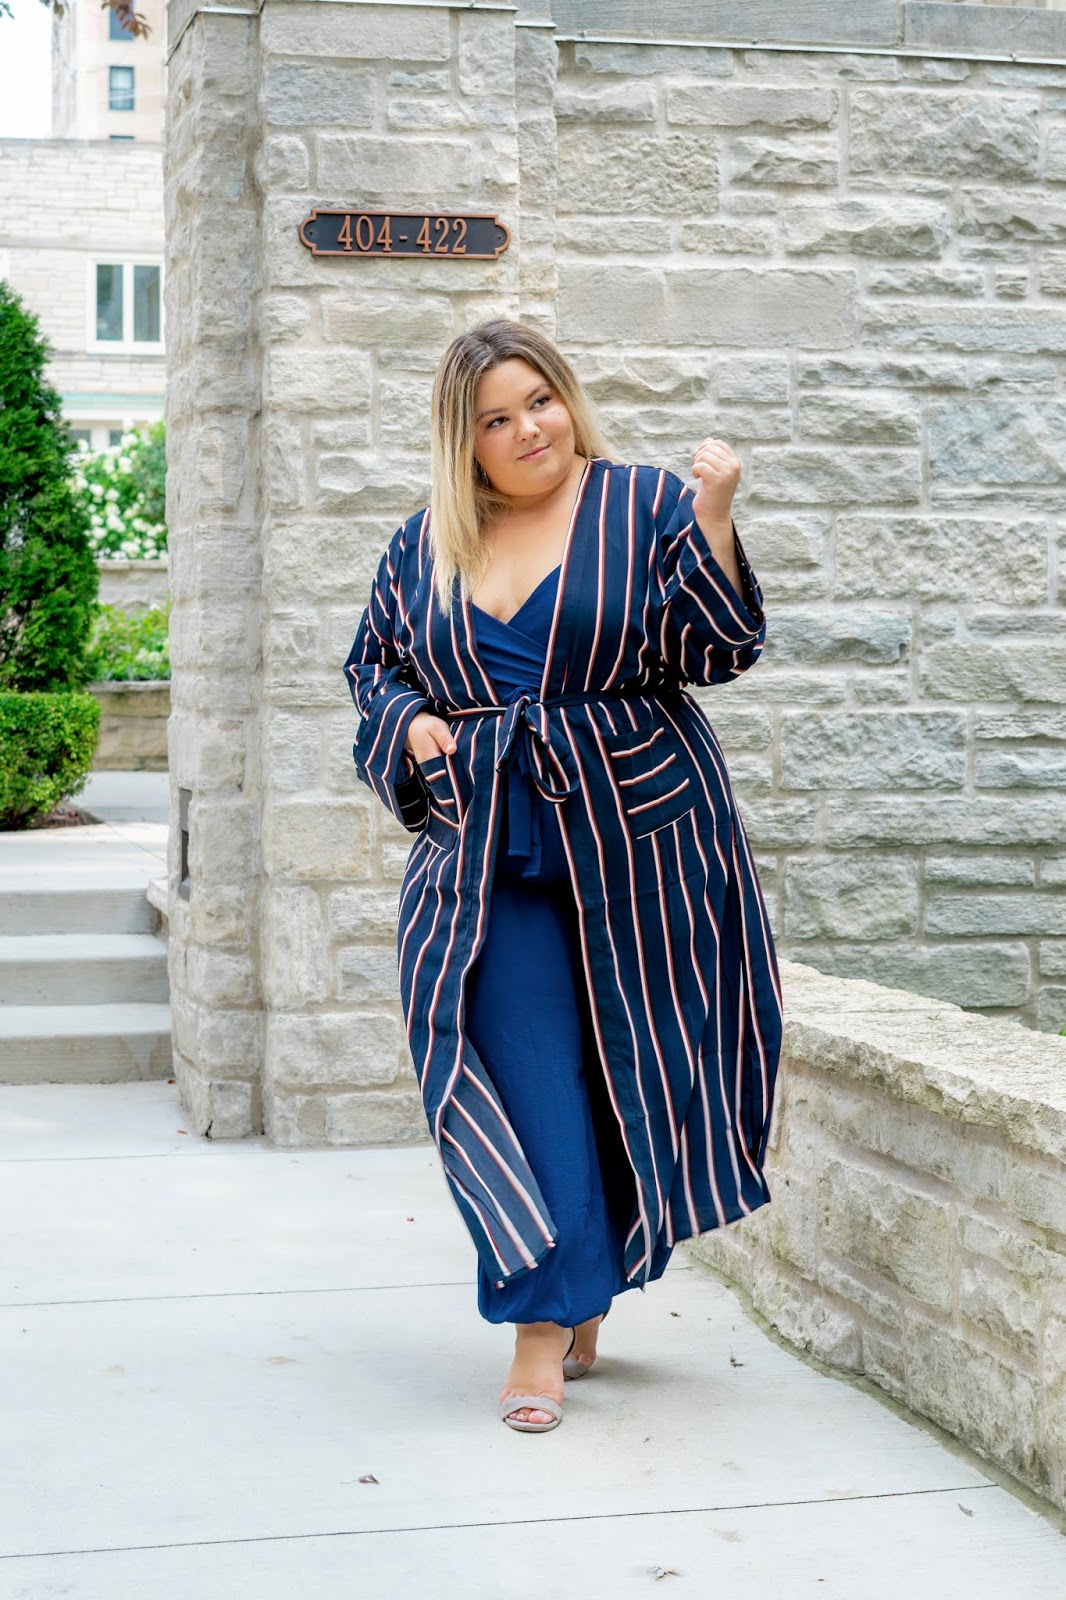 Chicago fashion blogger, Chicago plus size fashion blogger, natalie Craig, natalie in the city, plus size fashion, Chicago fashion, plus size fashion blogger, eff your beauty standards, fatshion, skorch magazine, Chicago model, plus size model, plus size petite, affordable plus size clothing, embrace your curves, plus model magazine,  petite plus size, fashion nova, fashion nova curve, jumpsuits, striped kimono